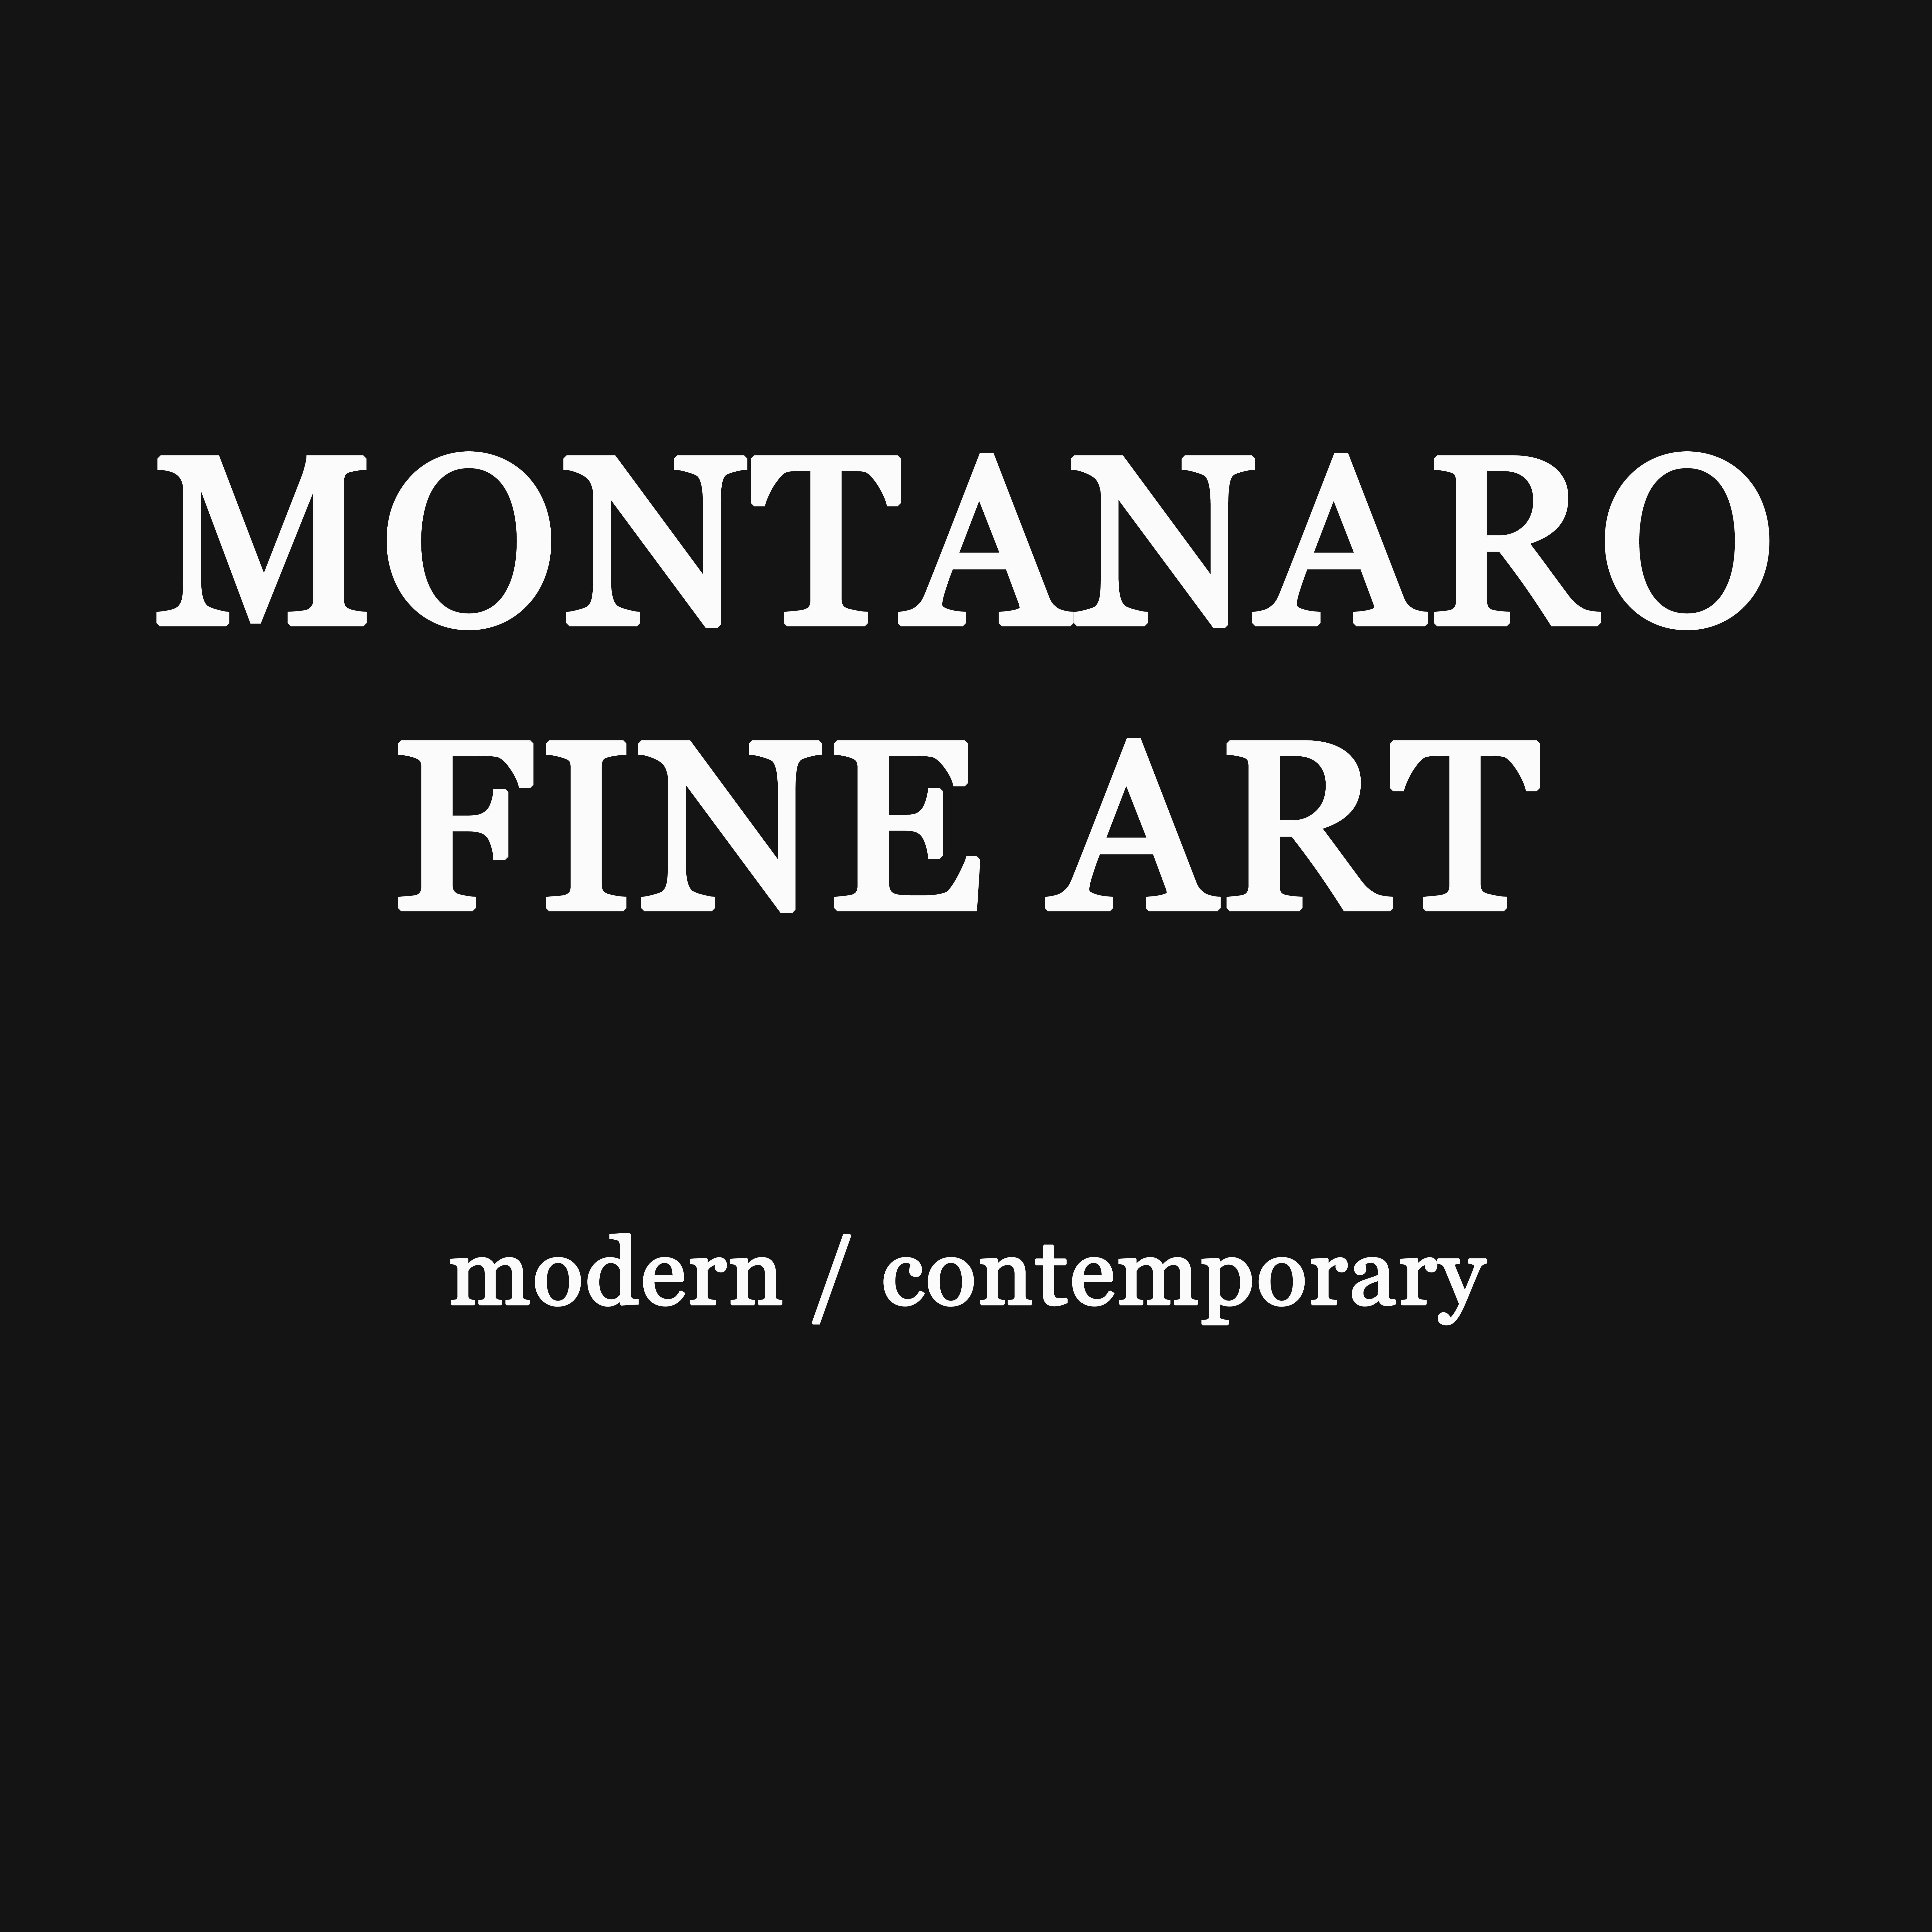 Montanaro Fine Art